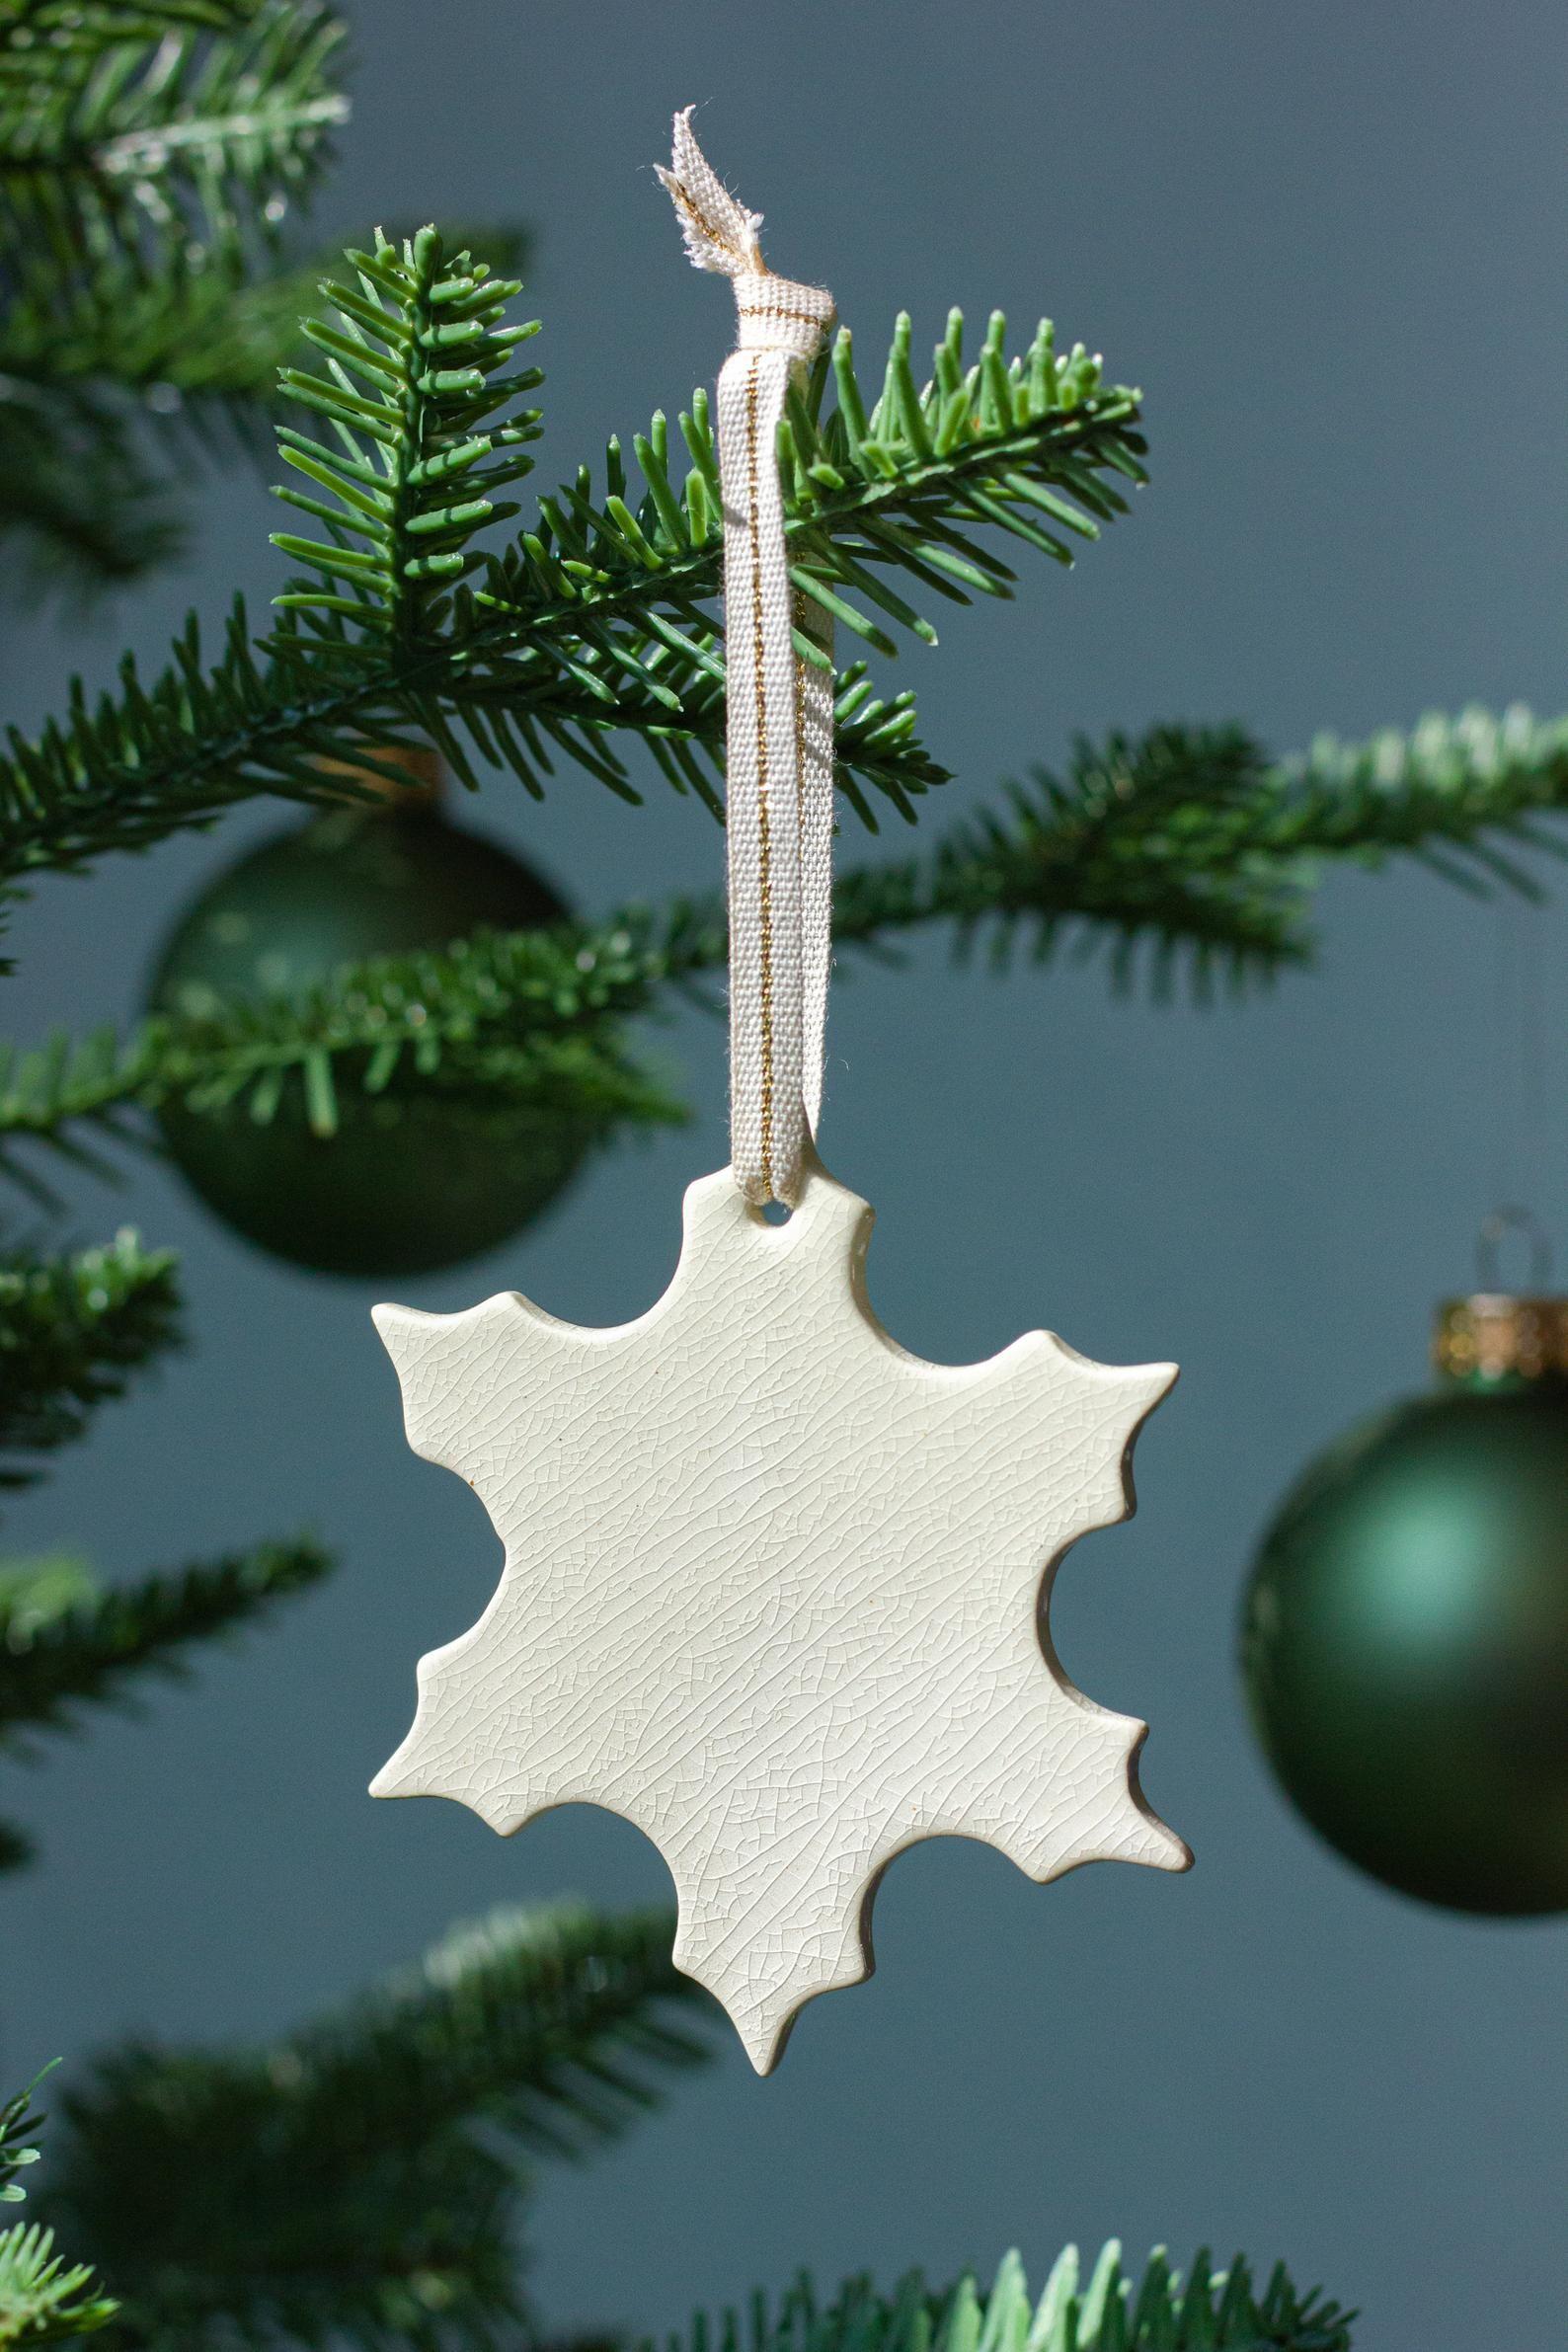 540 Holiday Decor And Inspiration Ideas